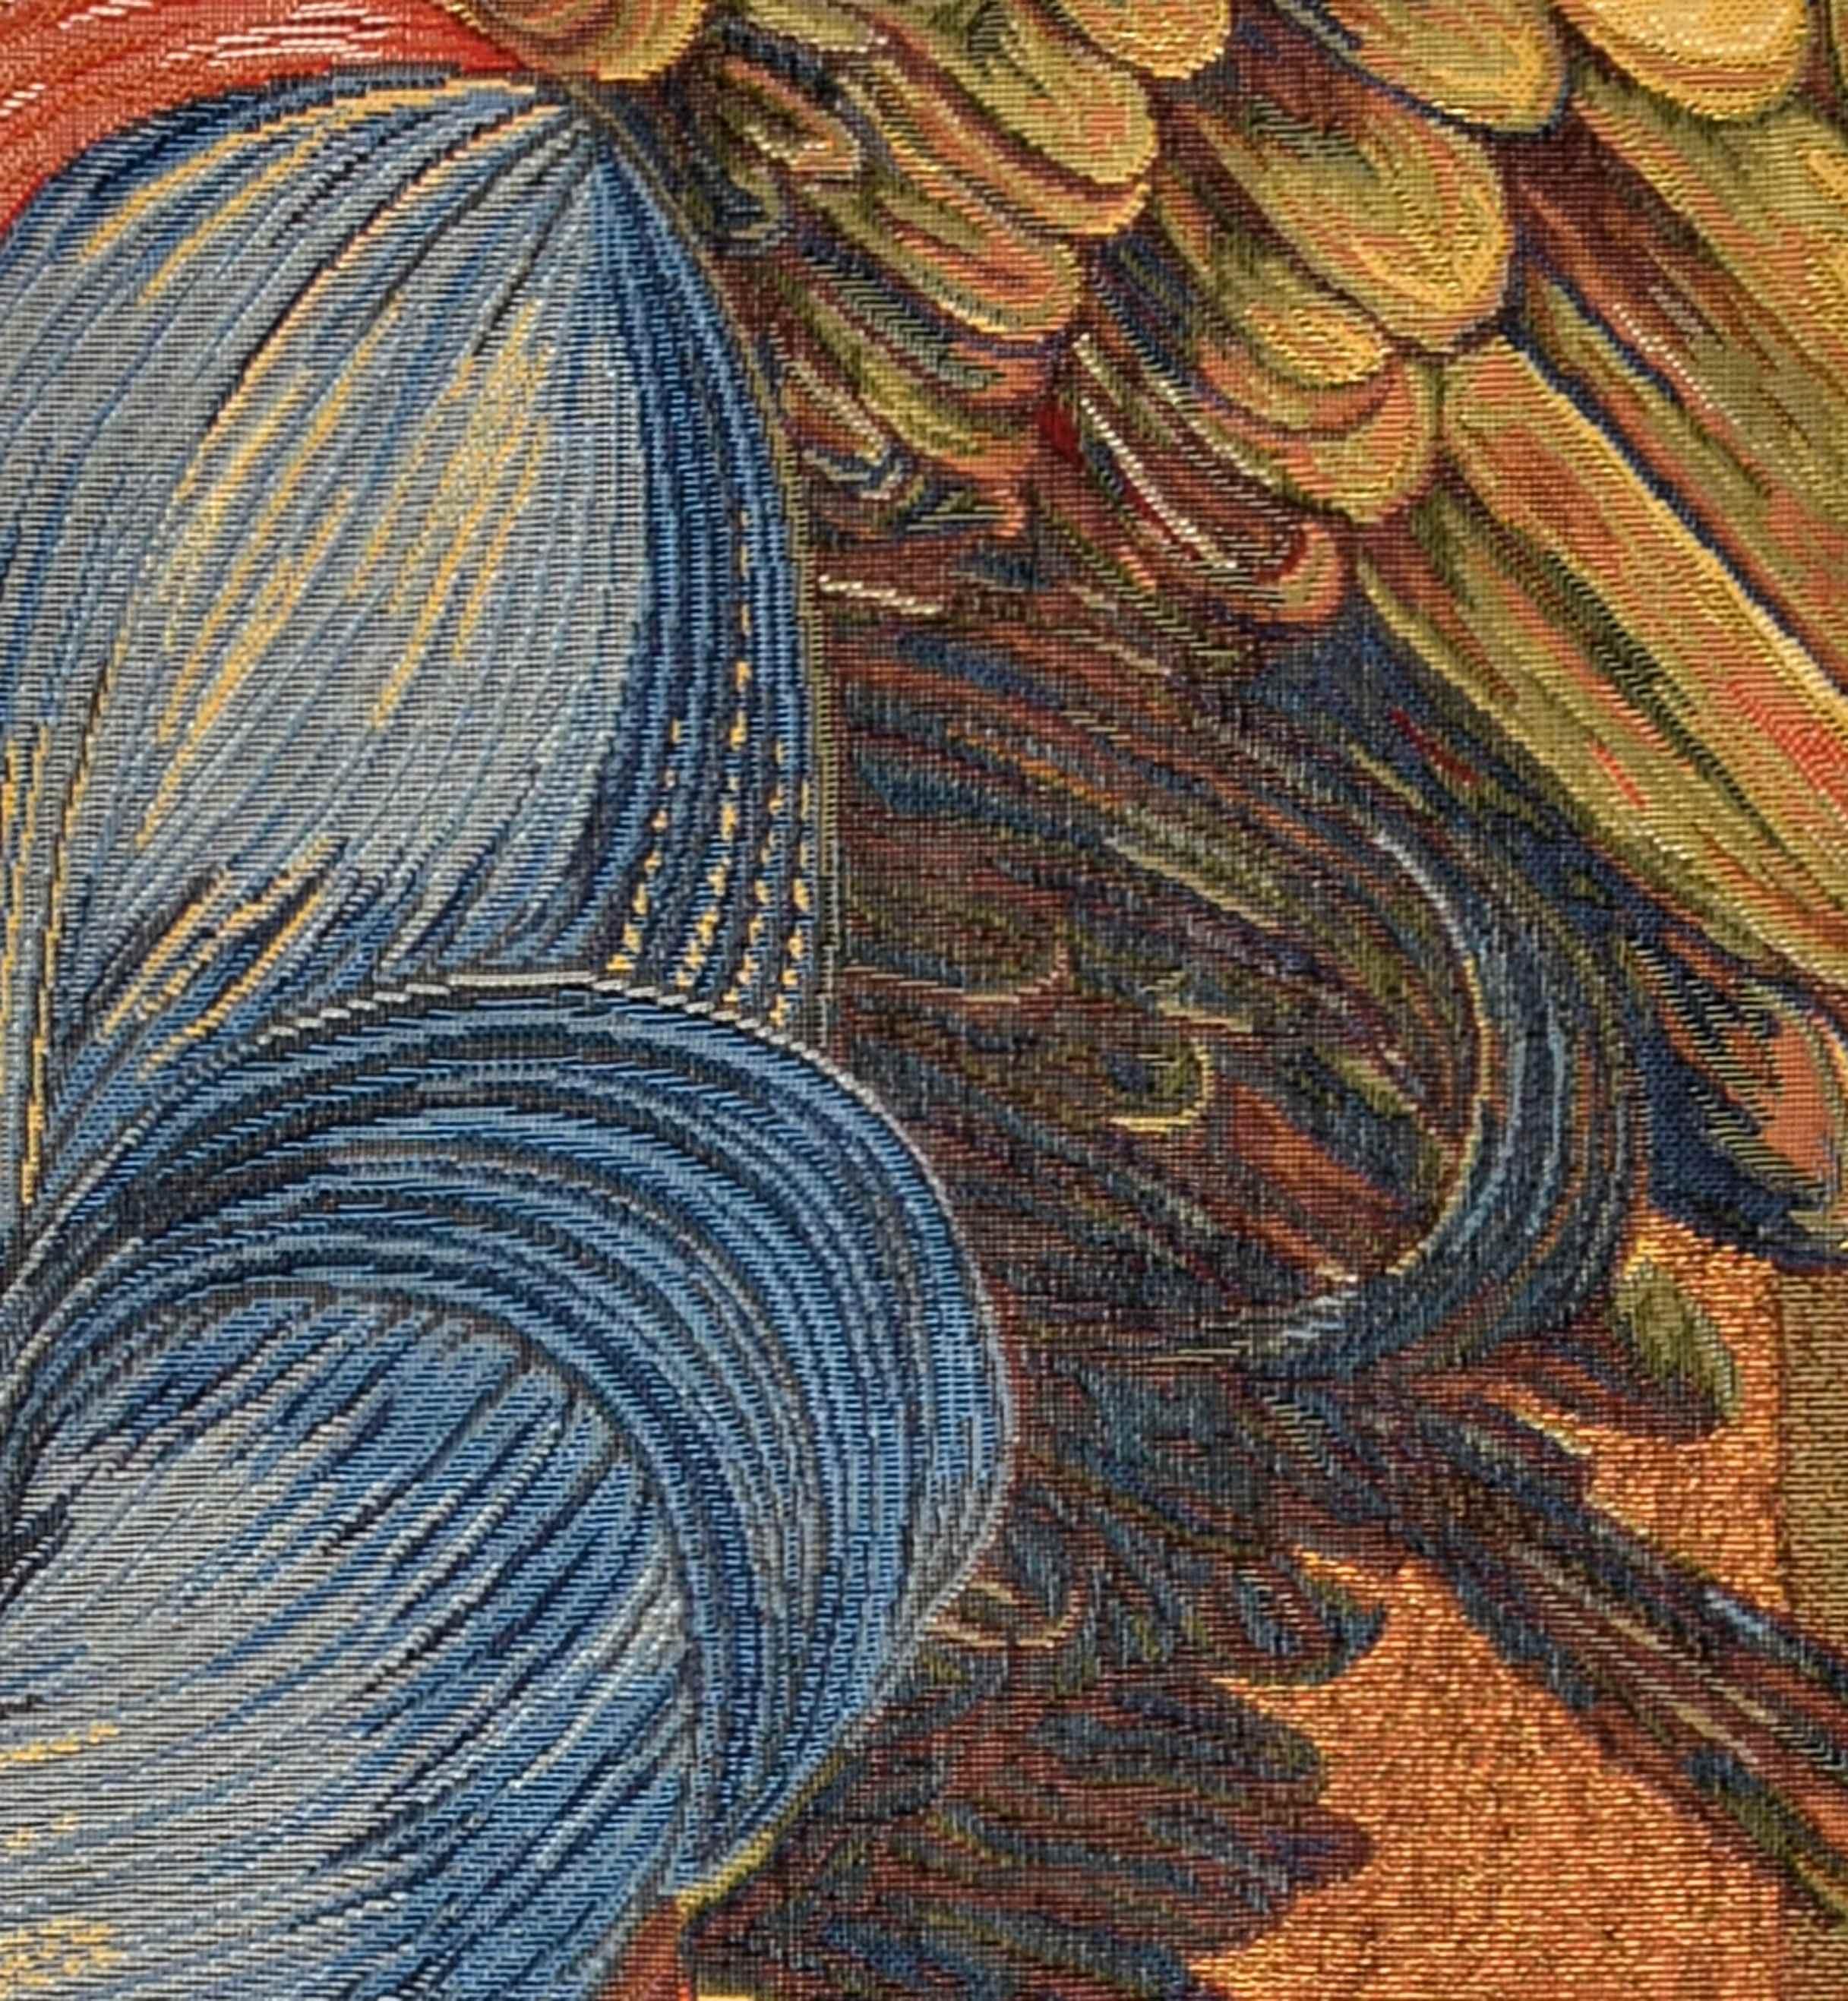 Tapiserie inspirata dupa o pictura de Burn Jones